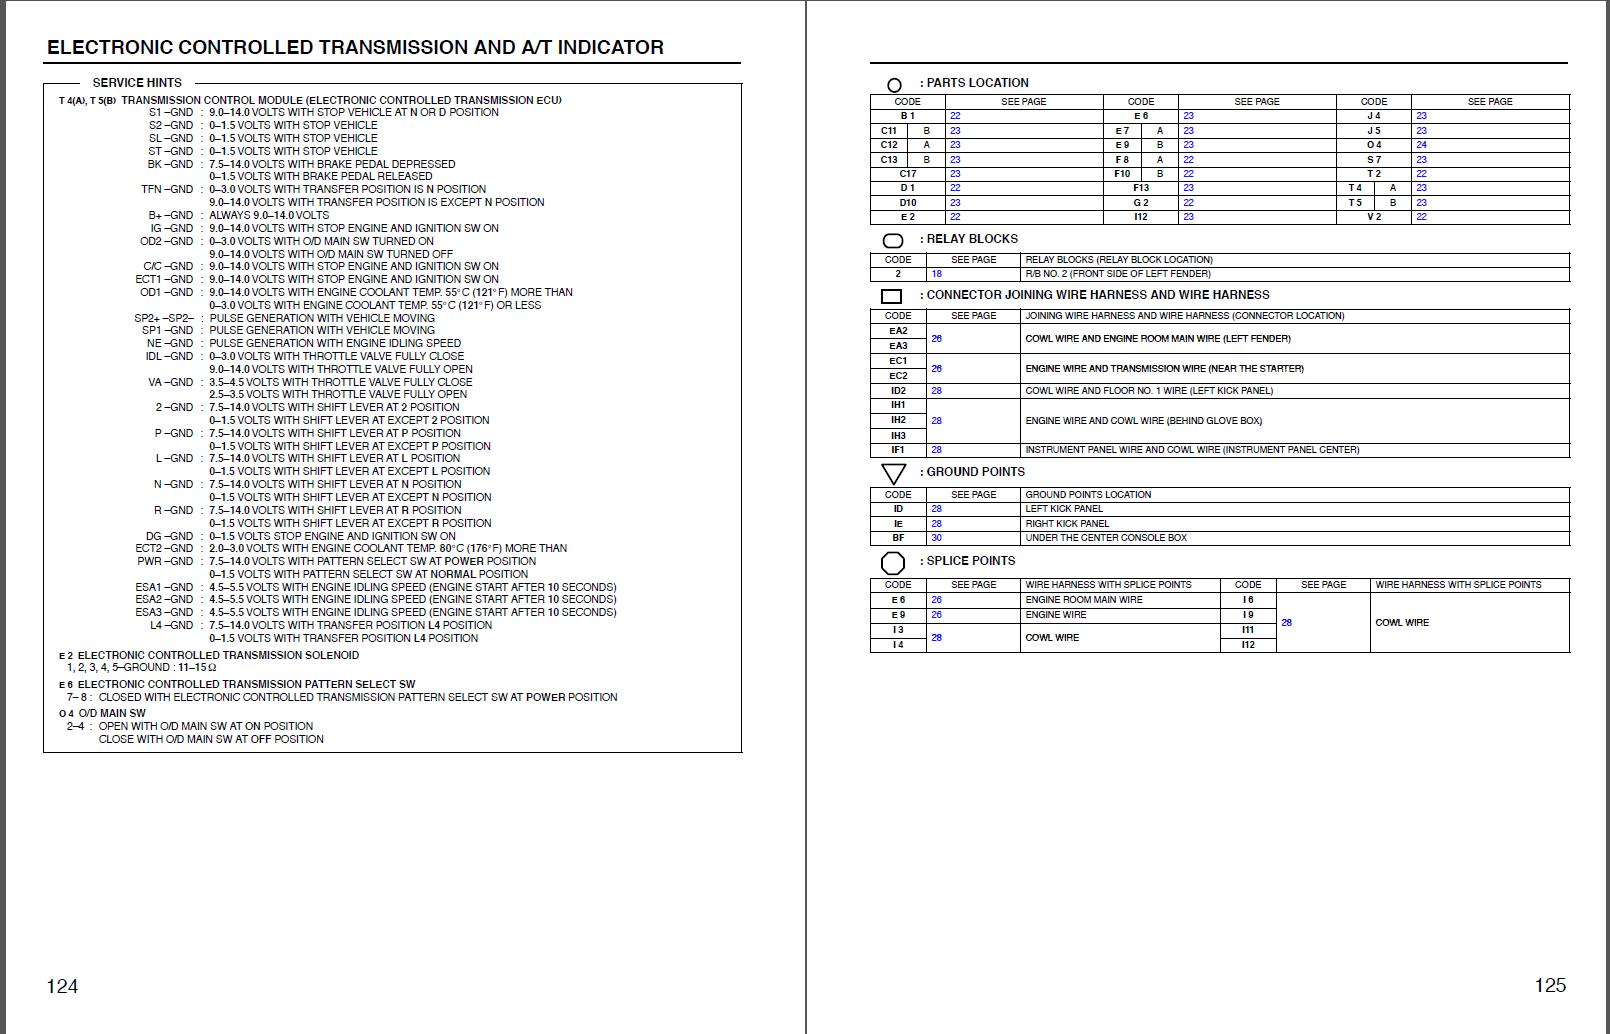 EWD, pg 124-125 (ECT and AT indicator).png